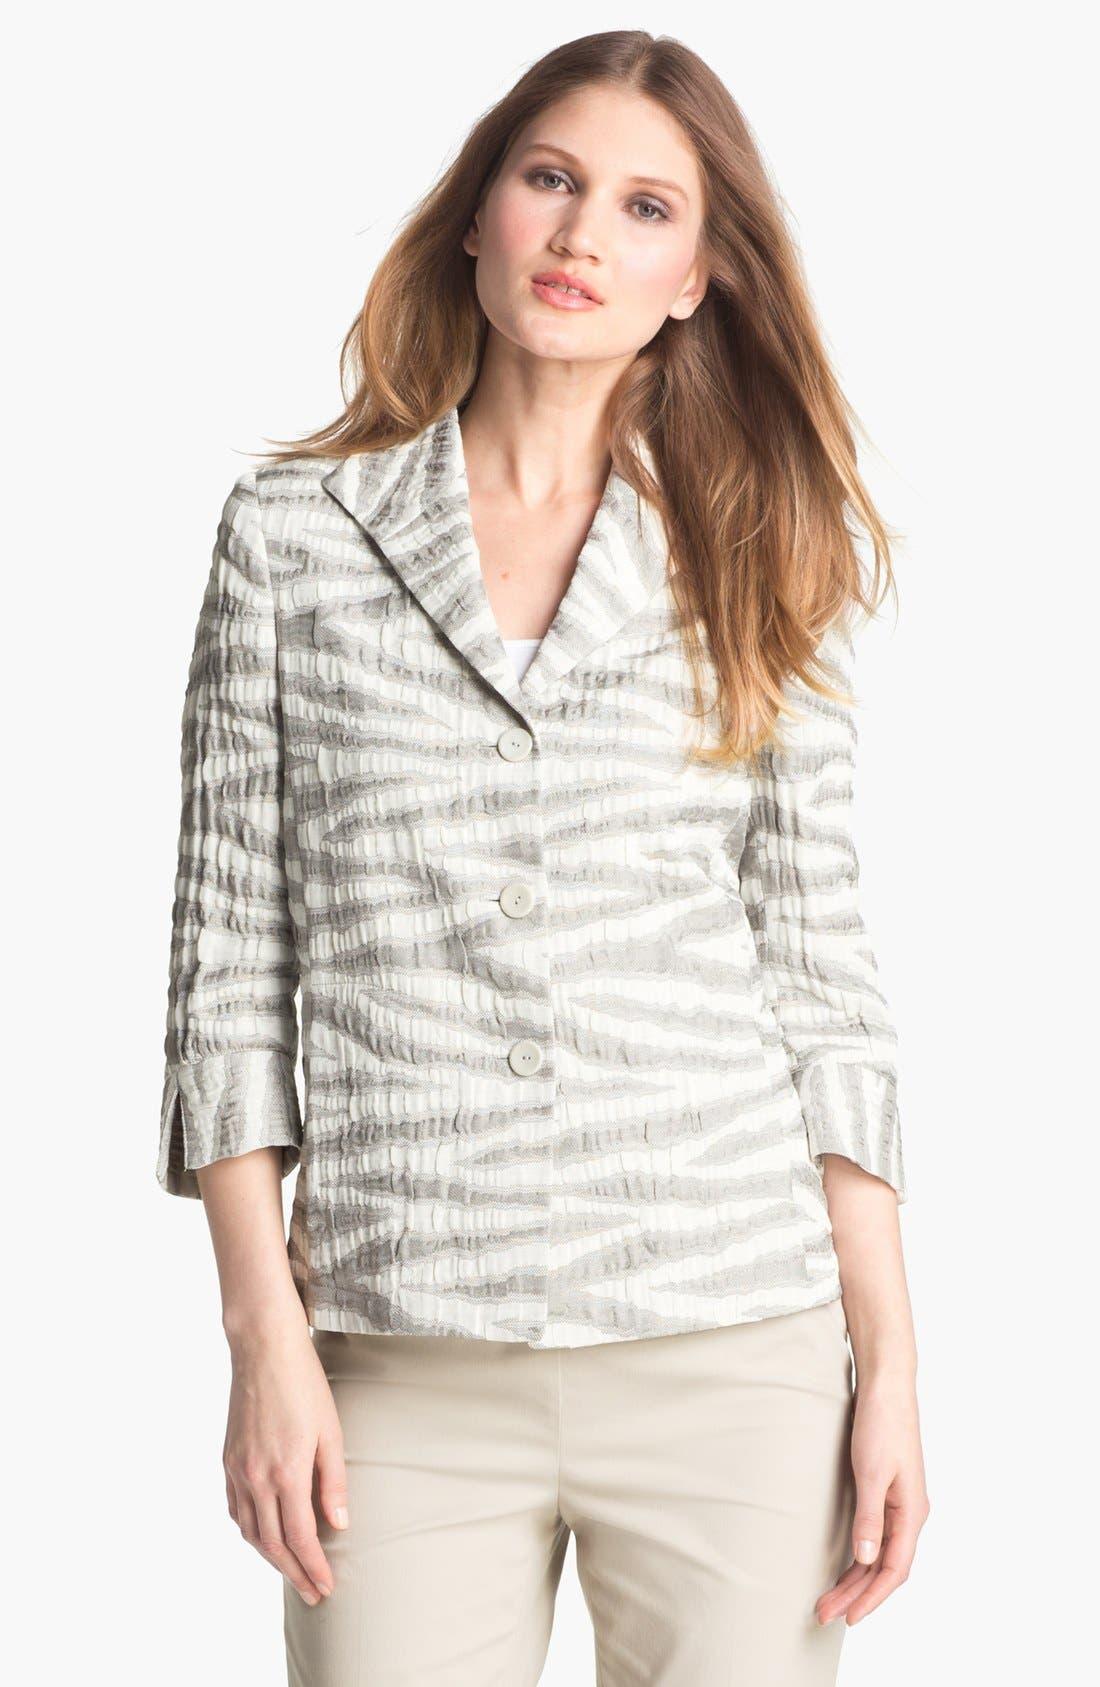 Alternate Image 1 Selected - Zanella 'Dusty Zebra' Jacket